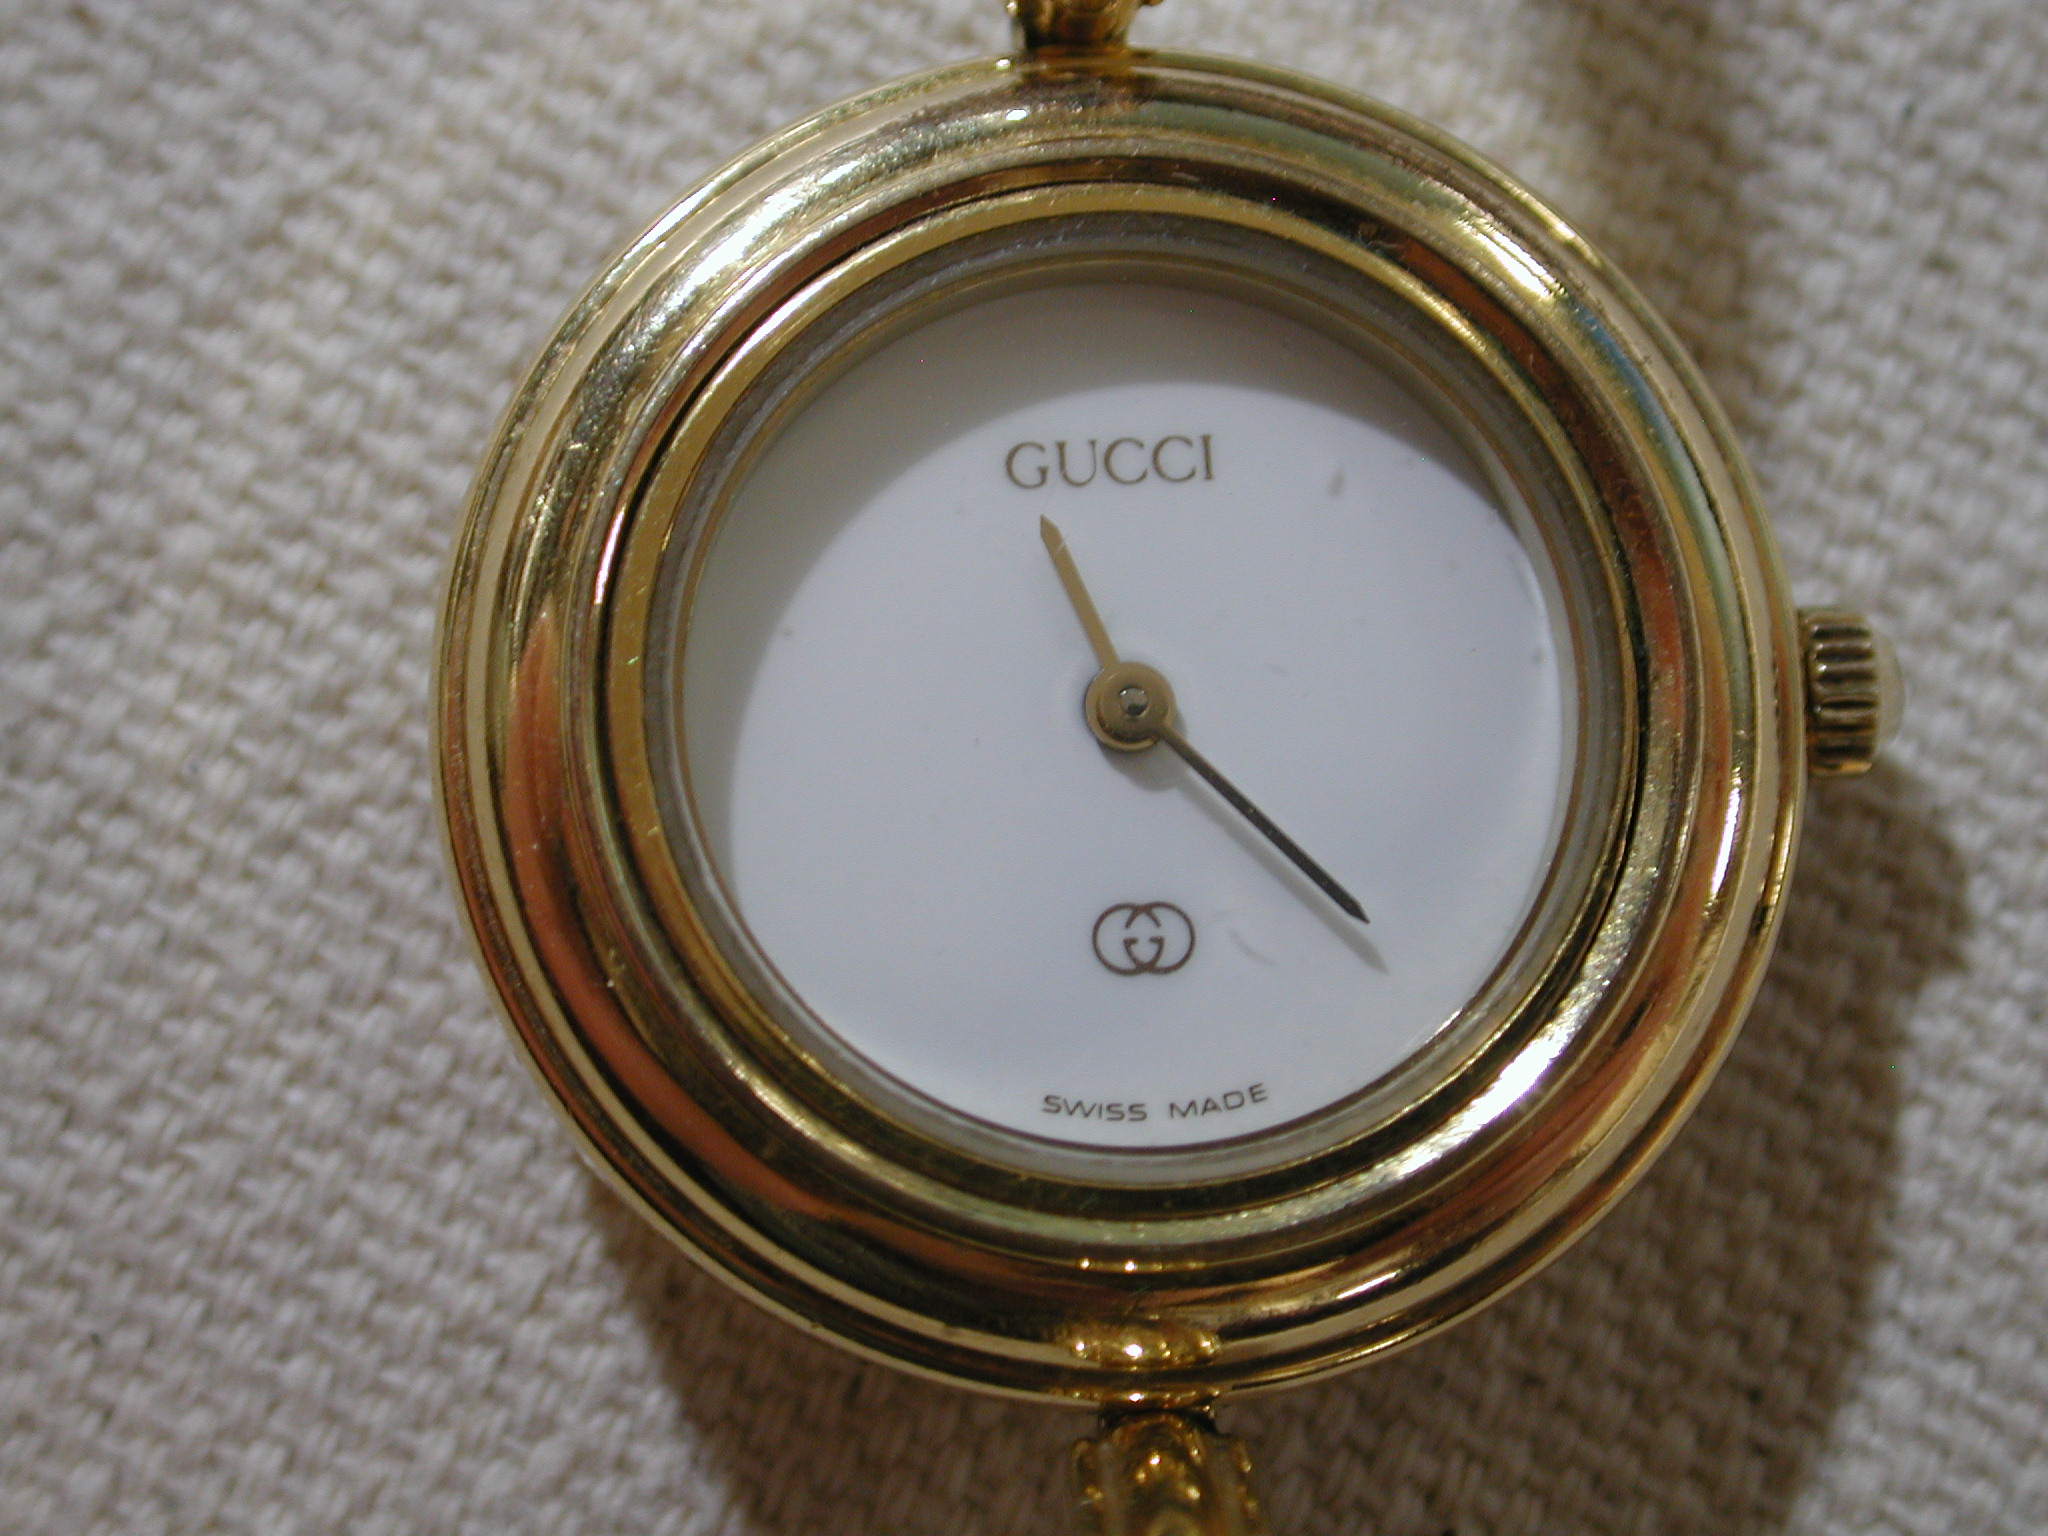 98fd6649ec3 Gucci 1100-L watch with 5 interchangeable bezels 4 - Bellport Jewelers